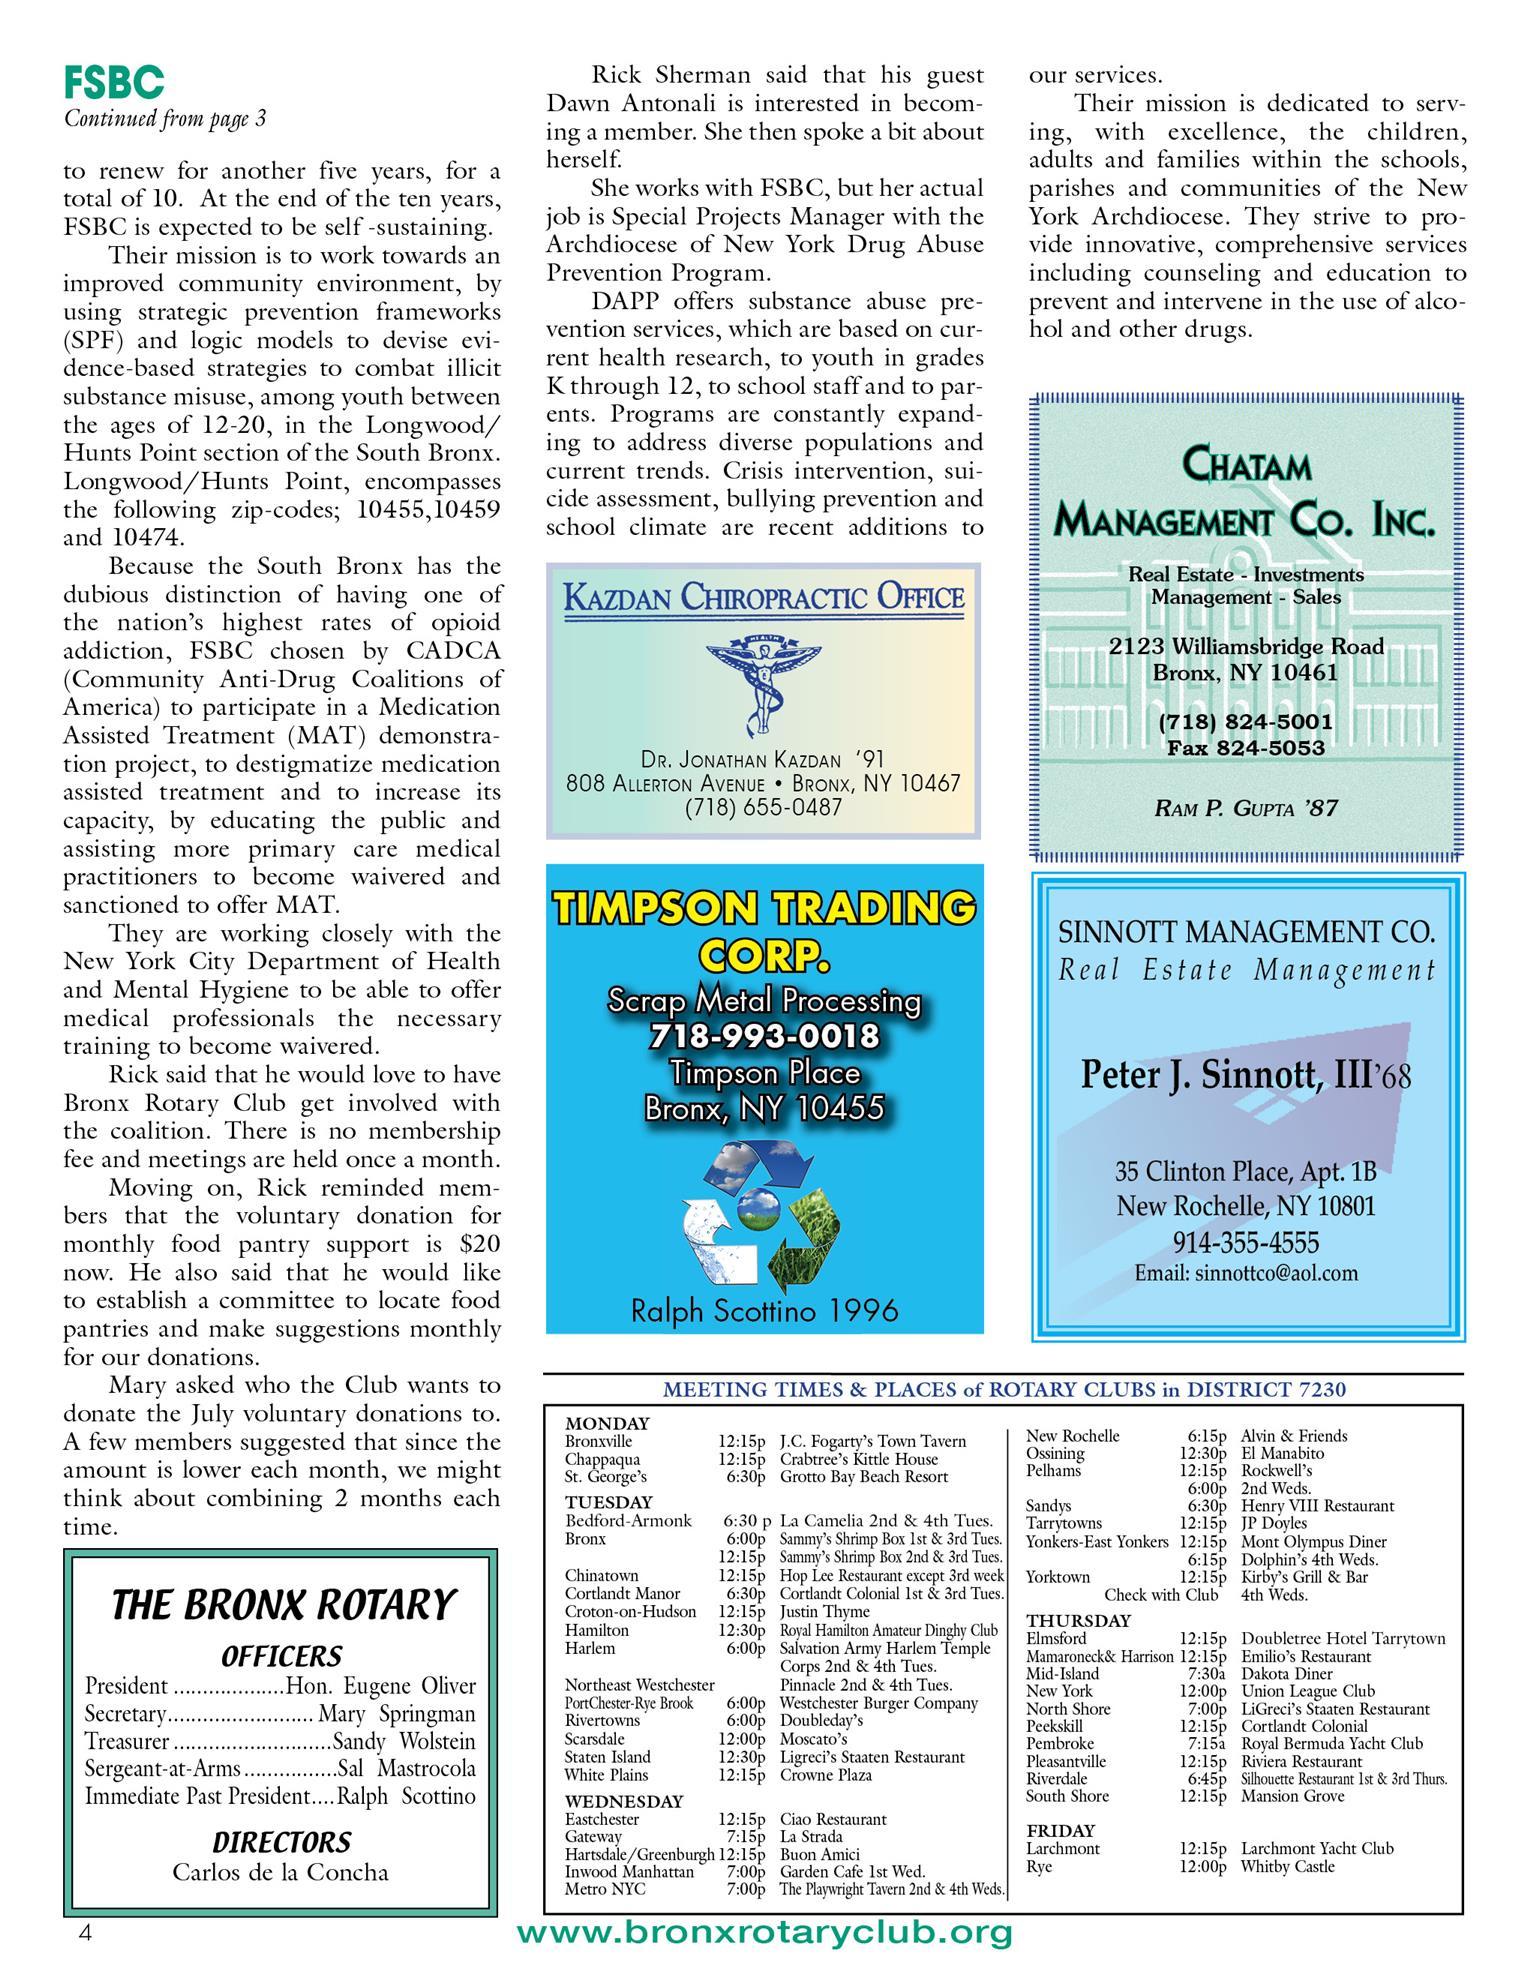 Tuesdays newsletter 7/27, 8/4 & 8/10/2021 p4